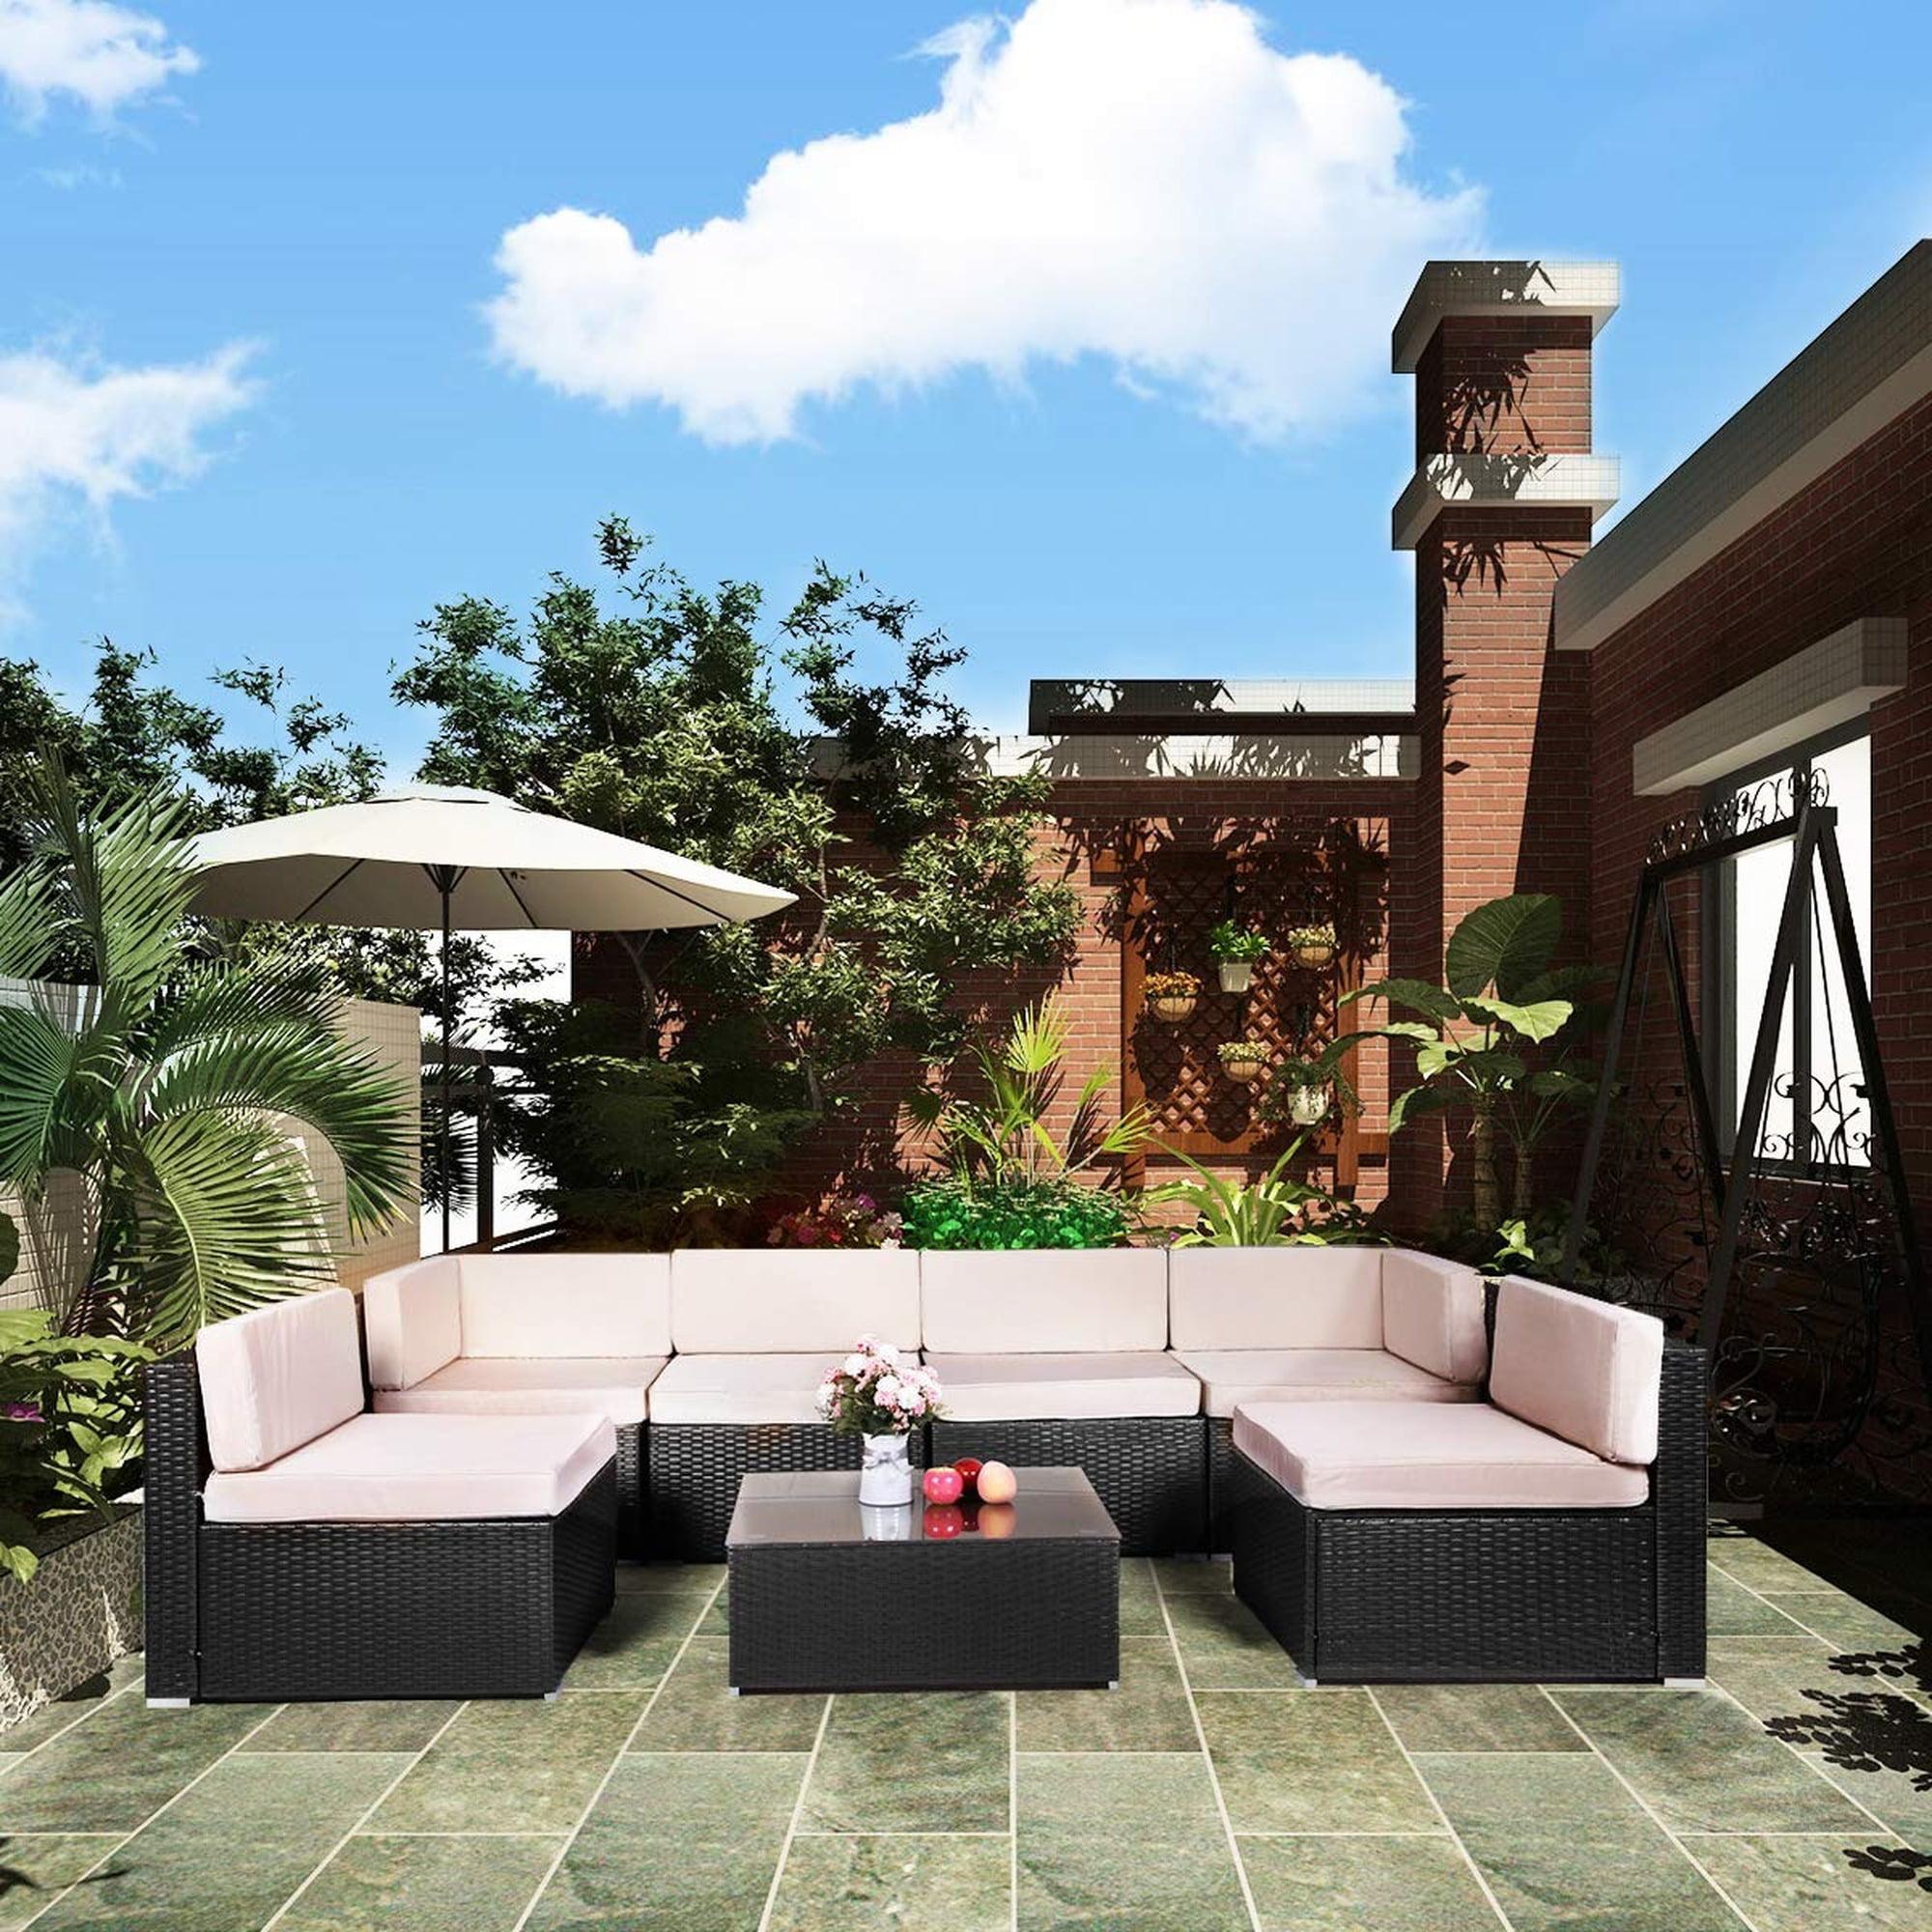 U-MAX 7 Pieces Patio PE Rattan Wicker Sofa Sectional ...